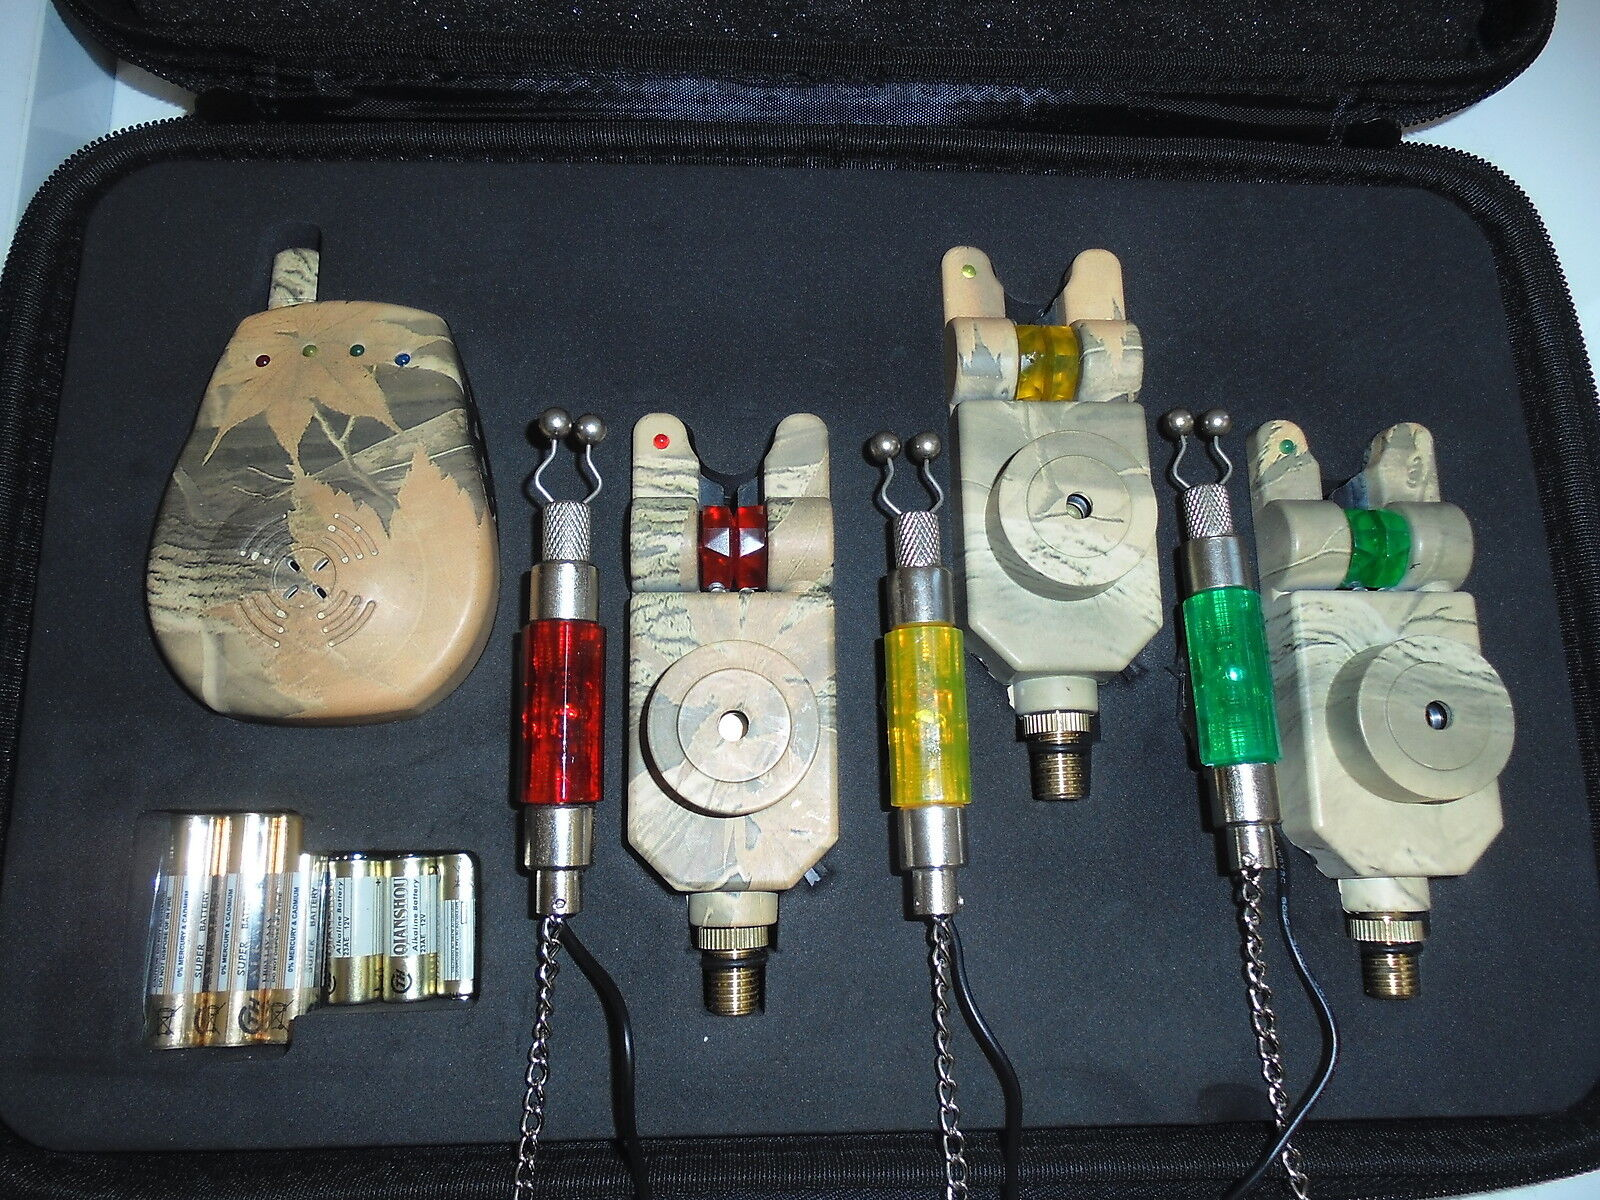 3 x Slim Camo bite alarms, receiver + 3 x illum hangers, Mufflers + Free Gift